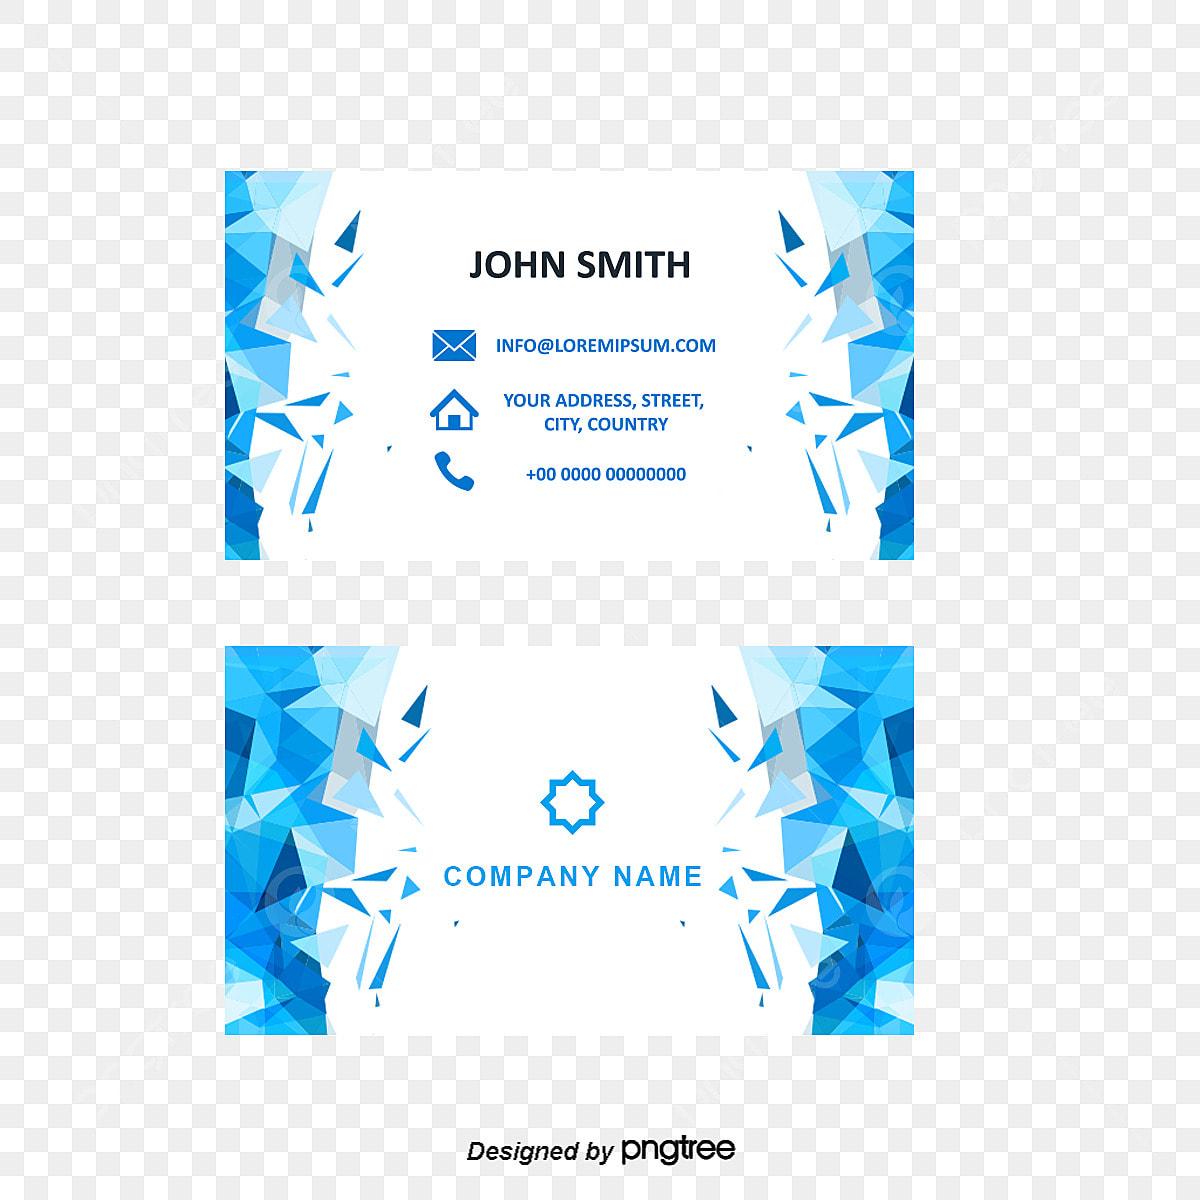 Blaue Farbe Design Material Vektorgrafiken Visitenkarten